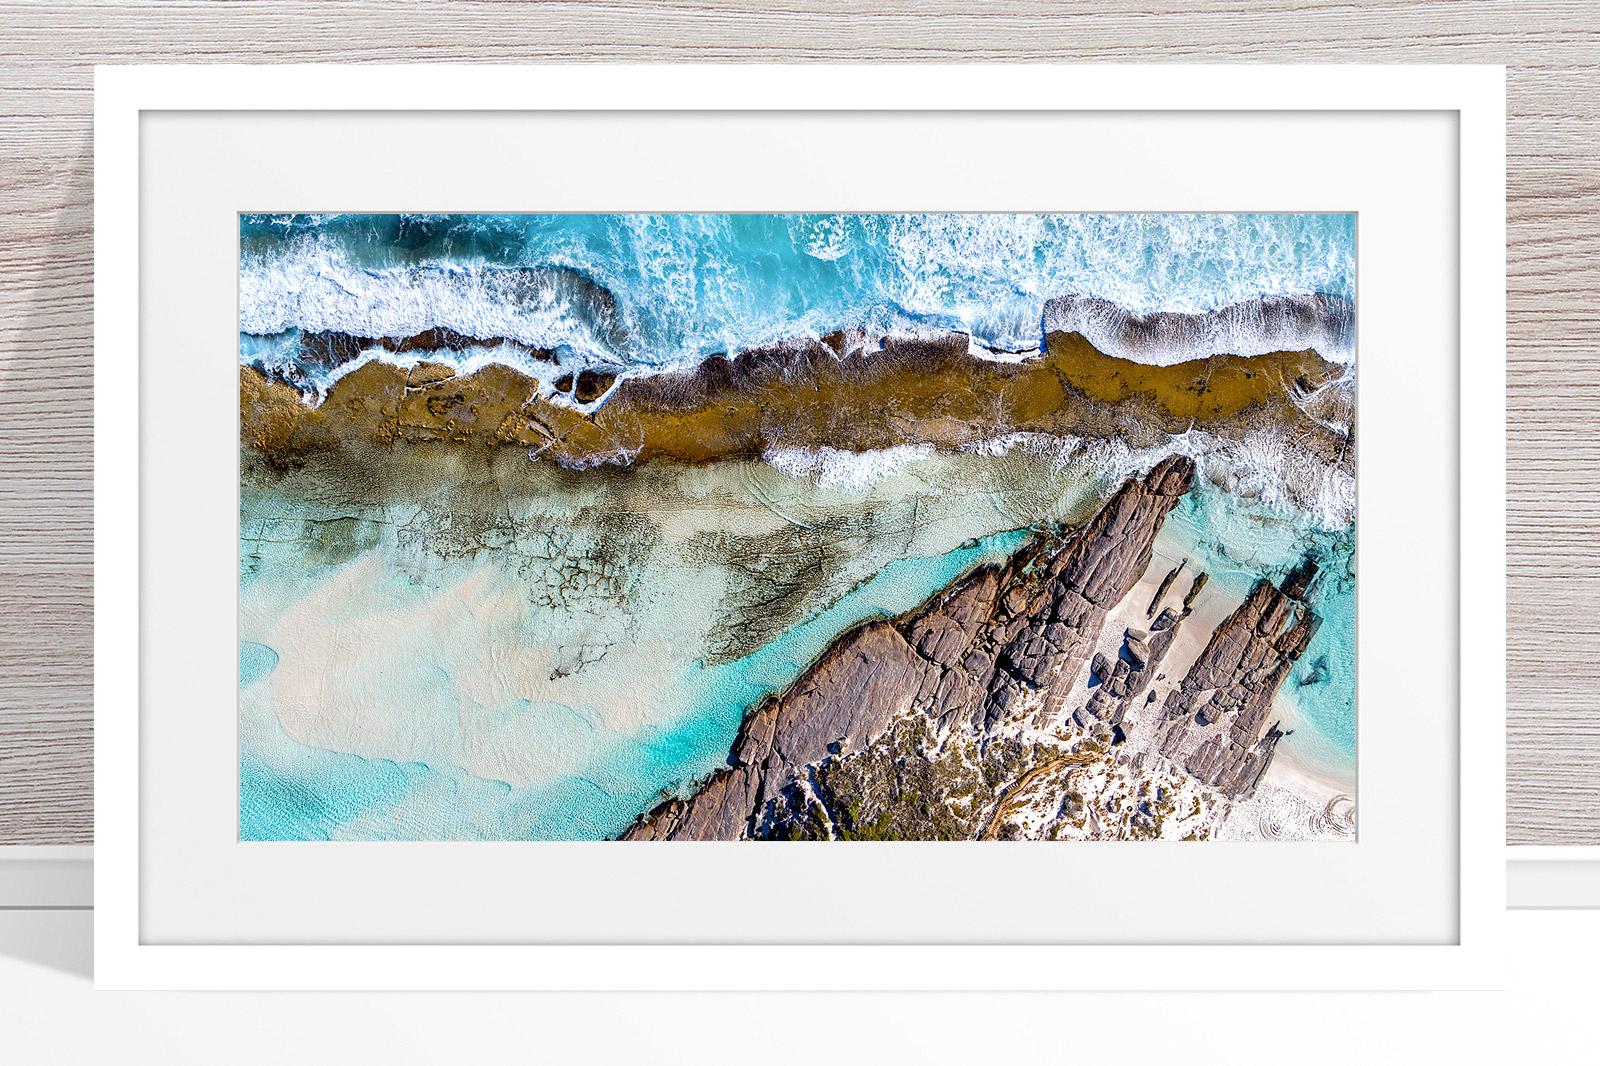 010 - Jason Mazur - '11 Mile Beach, Esperance' White Frame